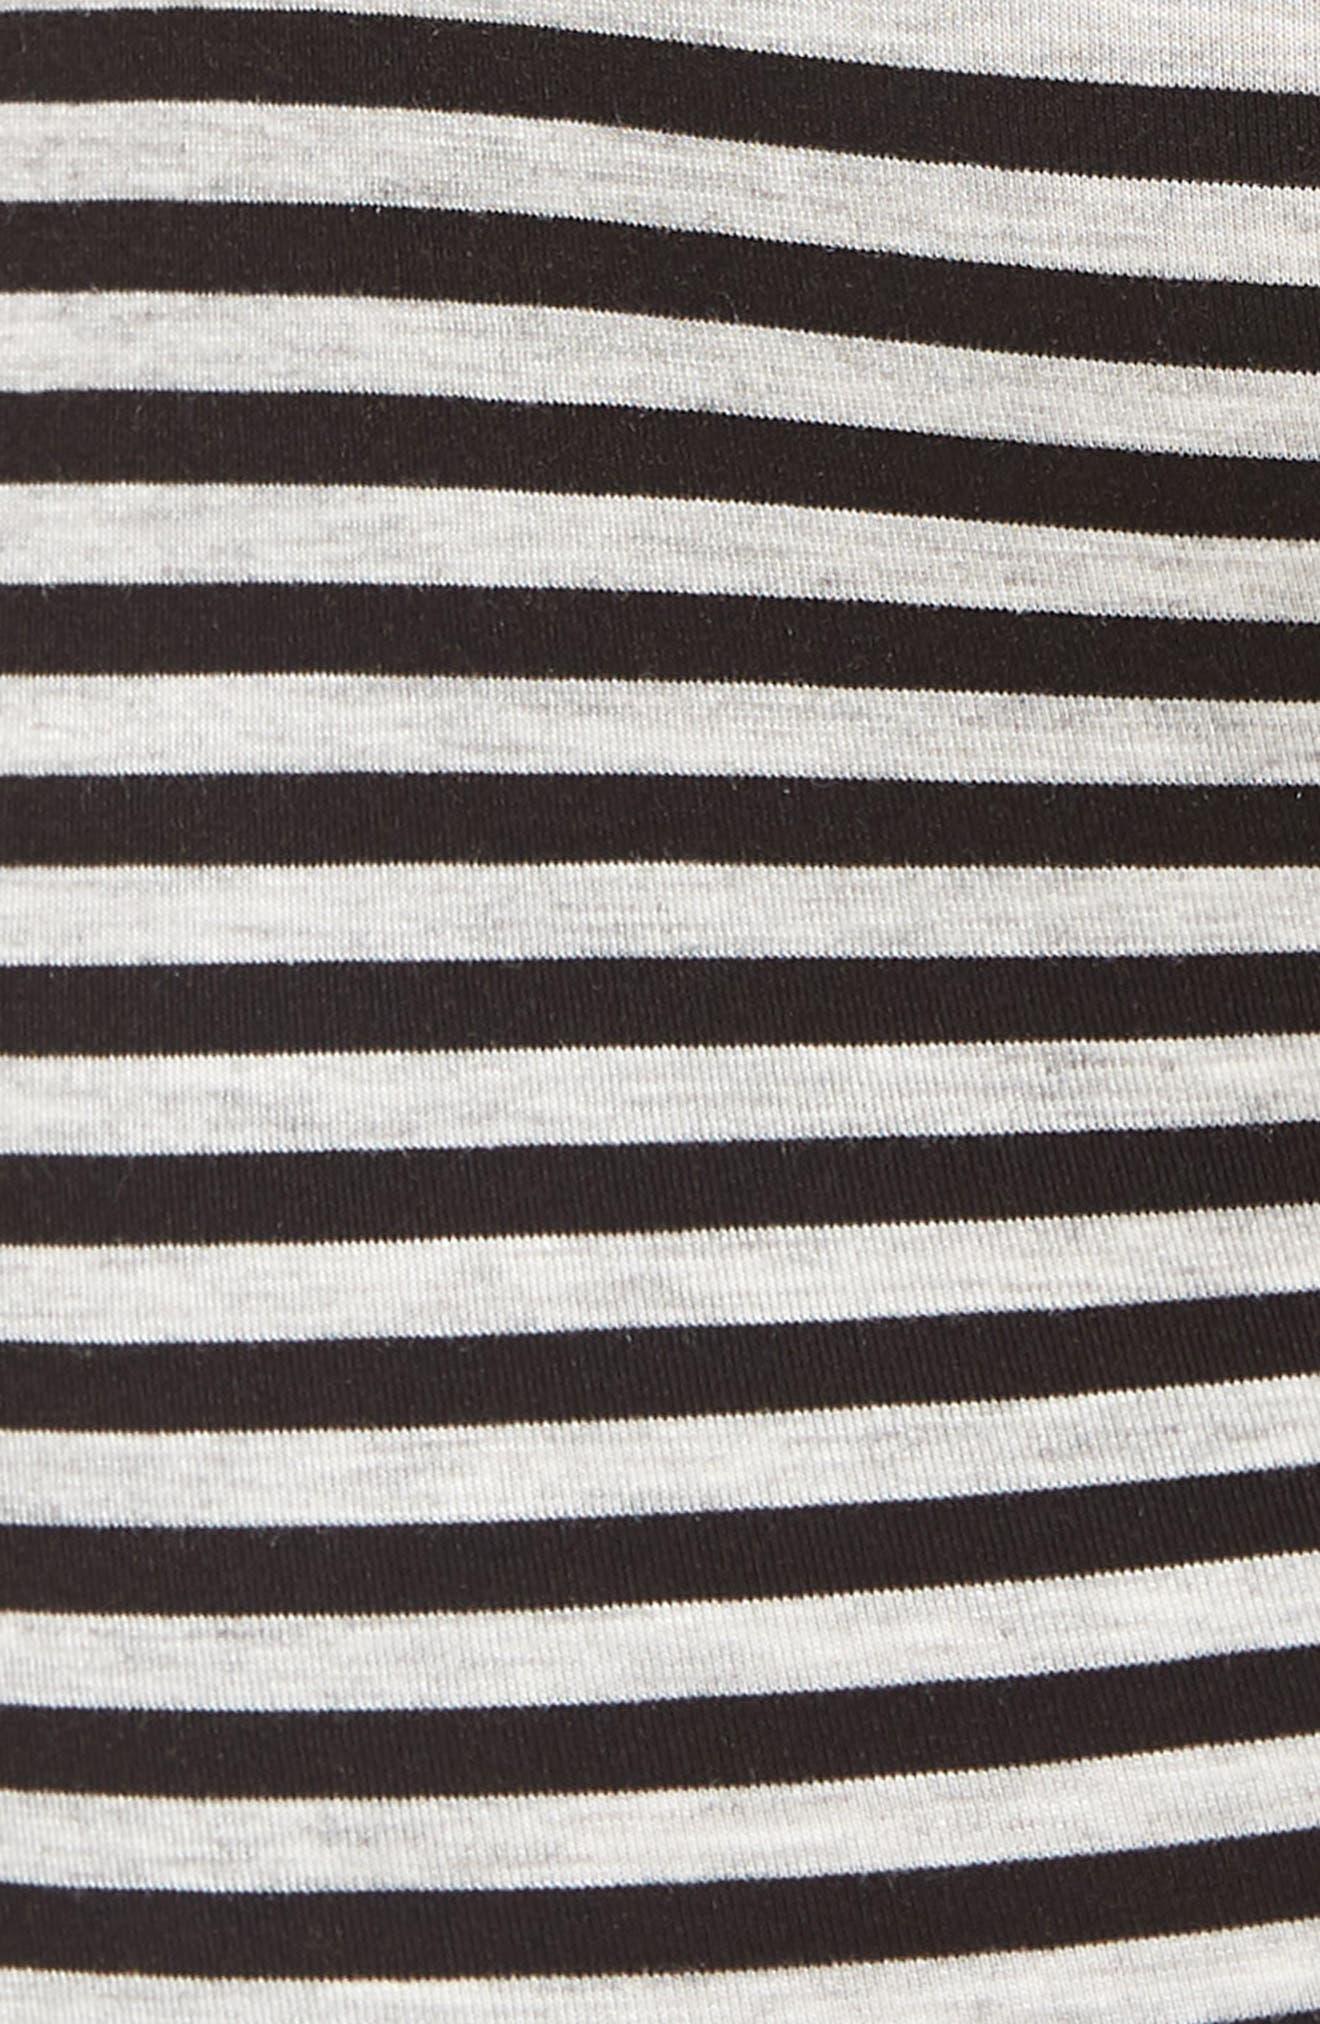 Vibe 2-Pack Boxer Briefs,                             Alternate thumbnail 6, color,                             Black/ Black Stripe